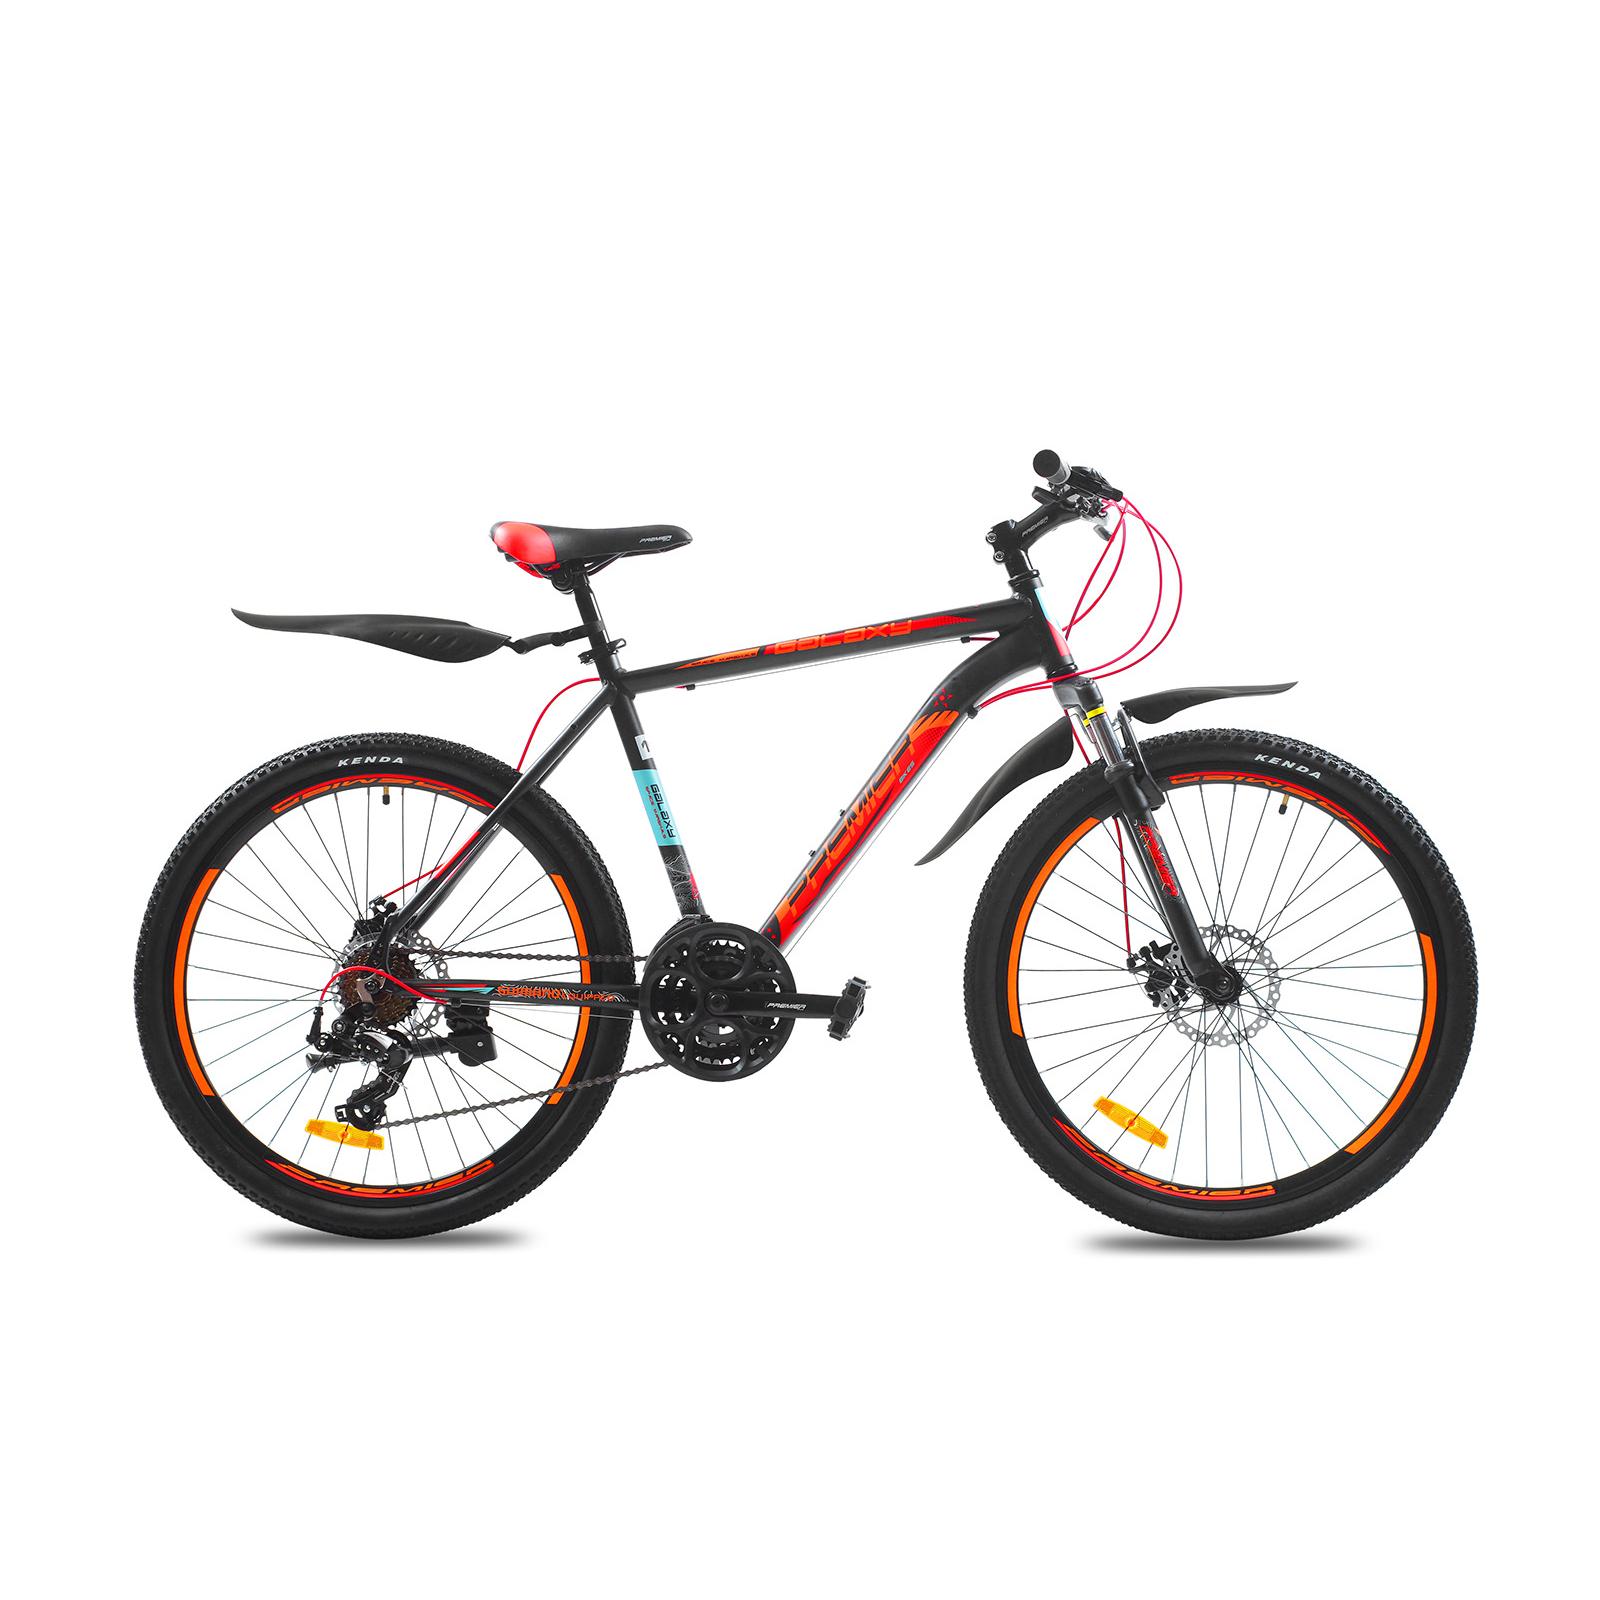 "Велосипед Premier Galaxy 2016 26 Disc 19"" matt black (SP0001583)"